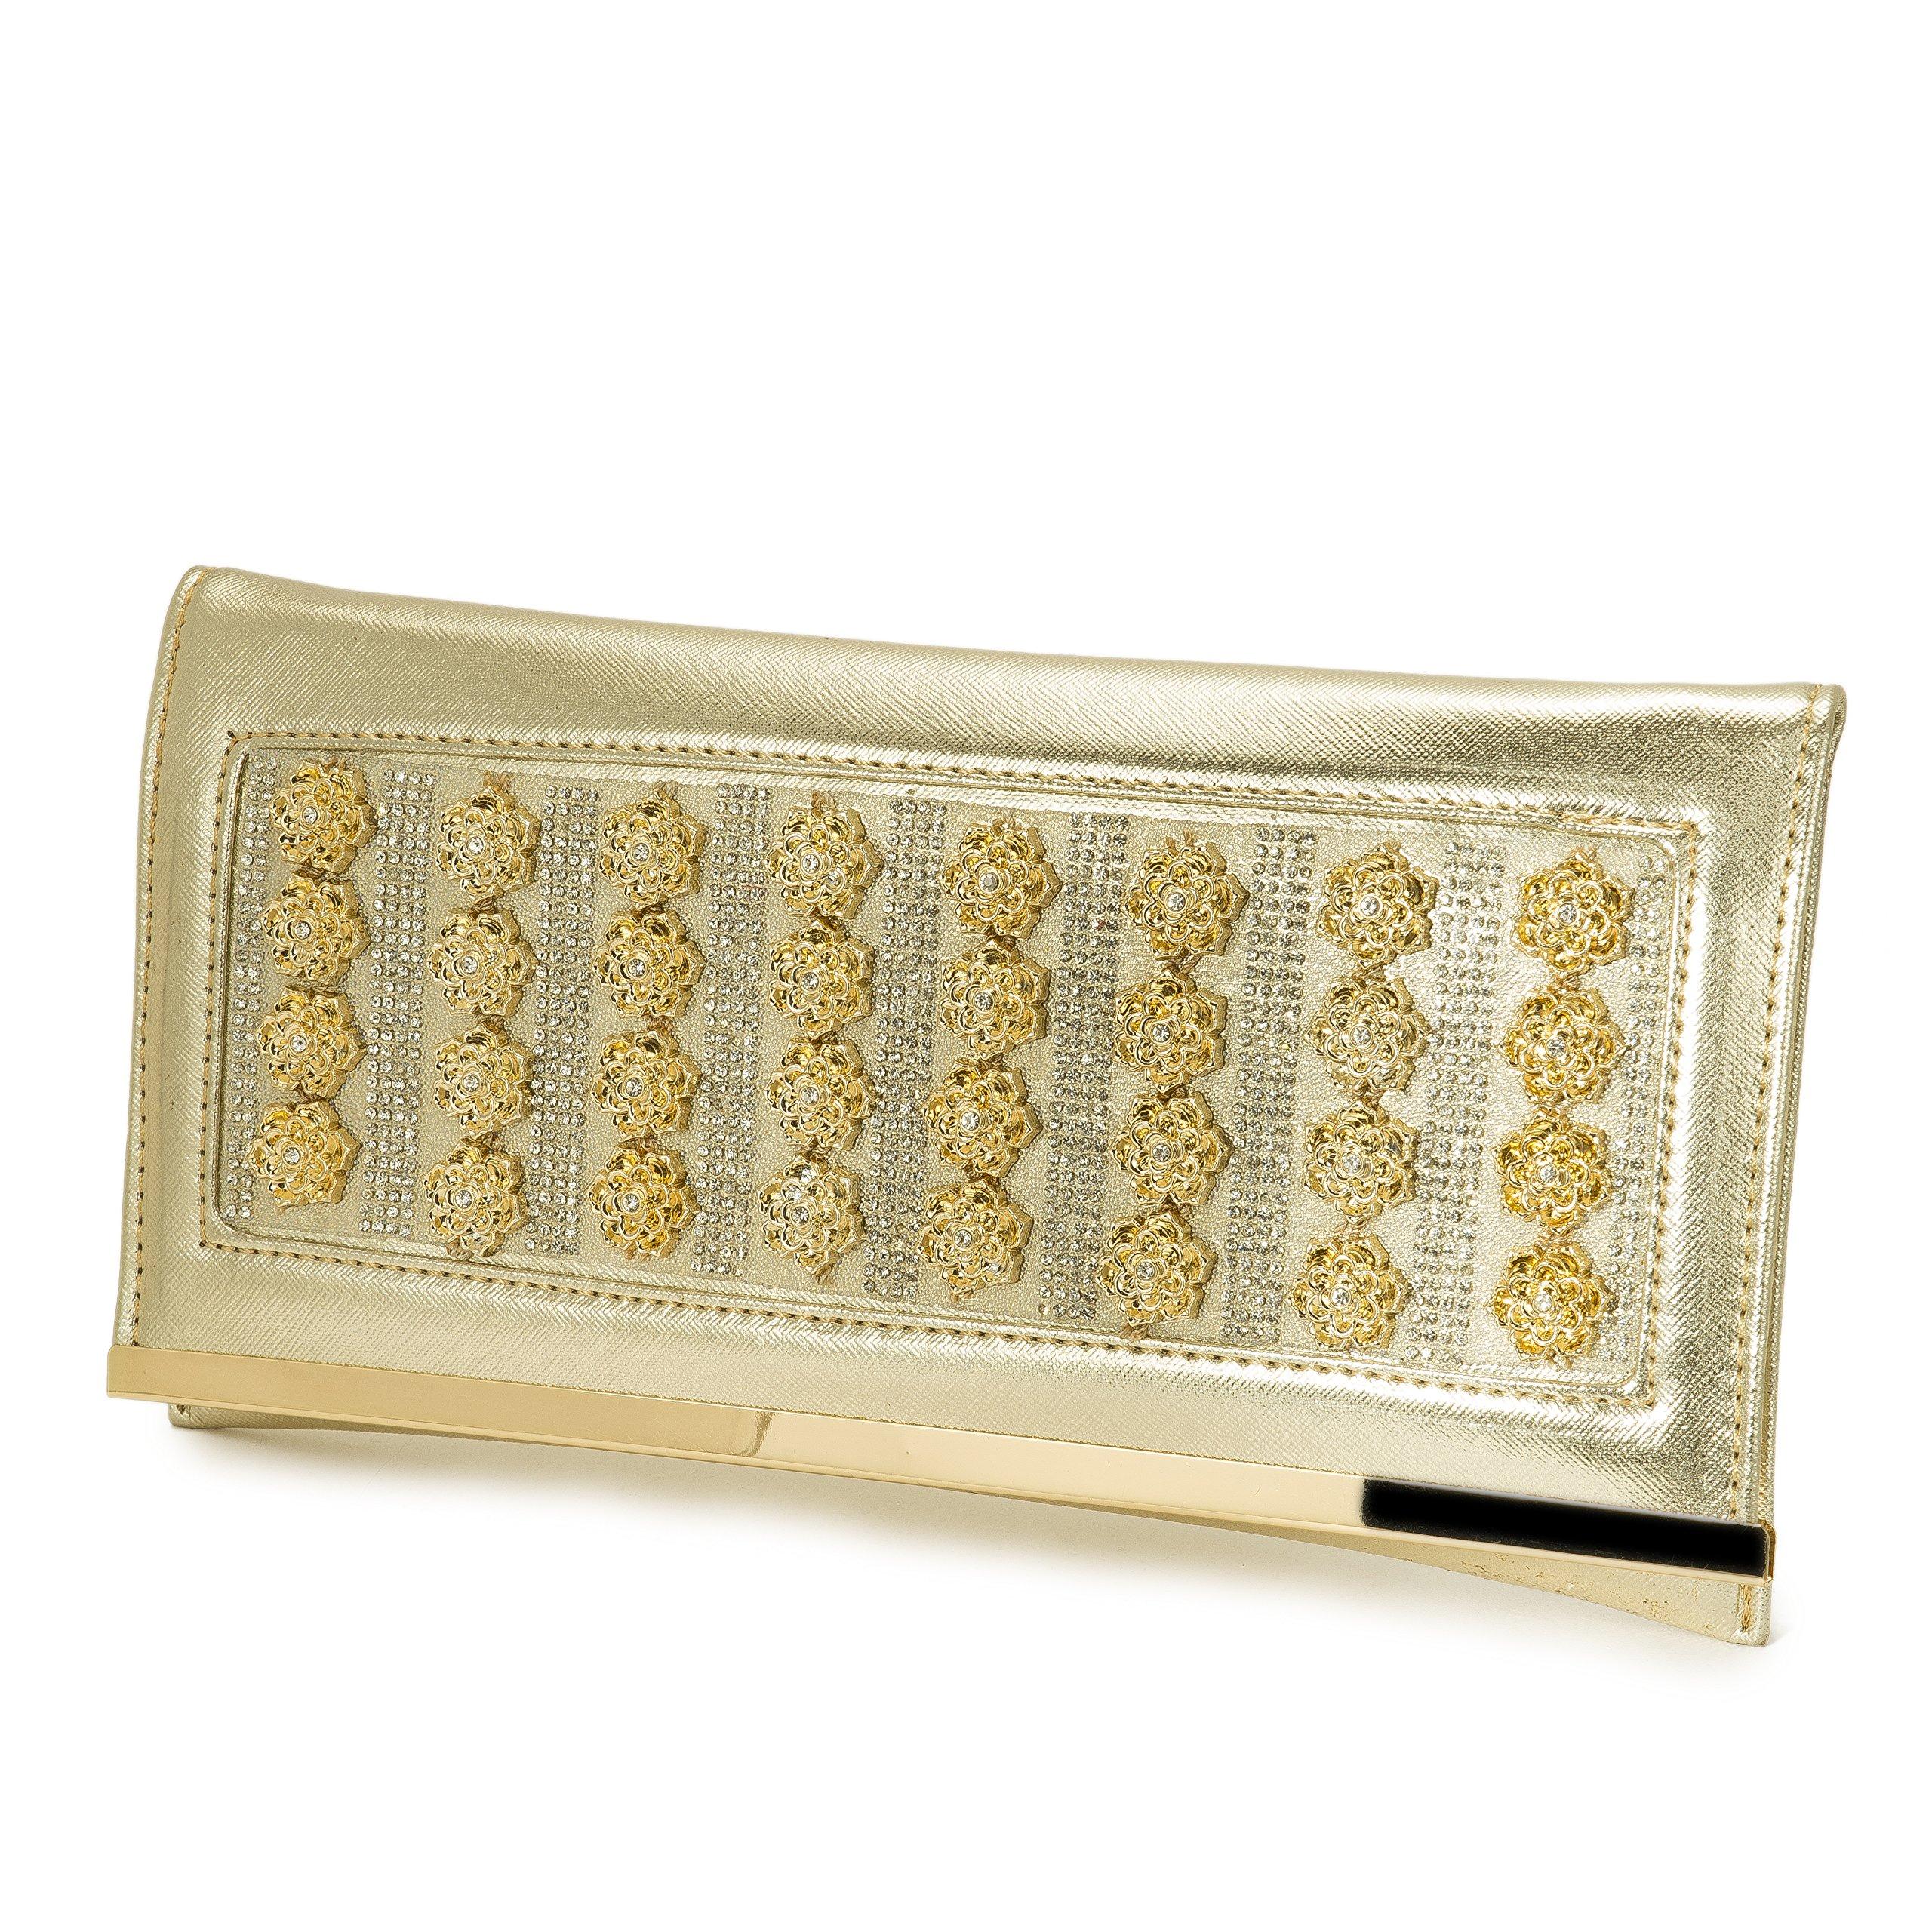 evening bags Luxury handbags Women gold clutch tote flower Appliques crystal diamonds pvc bags wedding burse